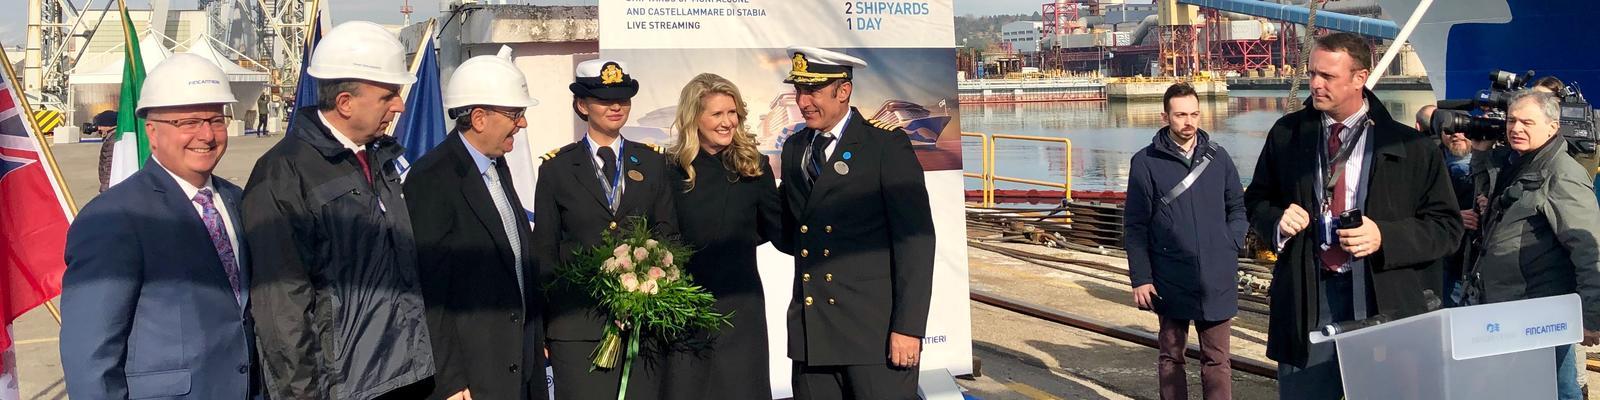 Princess Cruises President Jan Swartz, celebrating major milestones at the Fincantieri shipyard in Monfalcone, Italy (Photo: Chris Gray Faust)